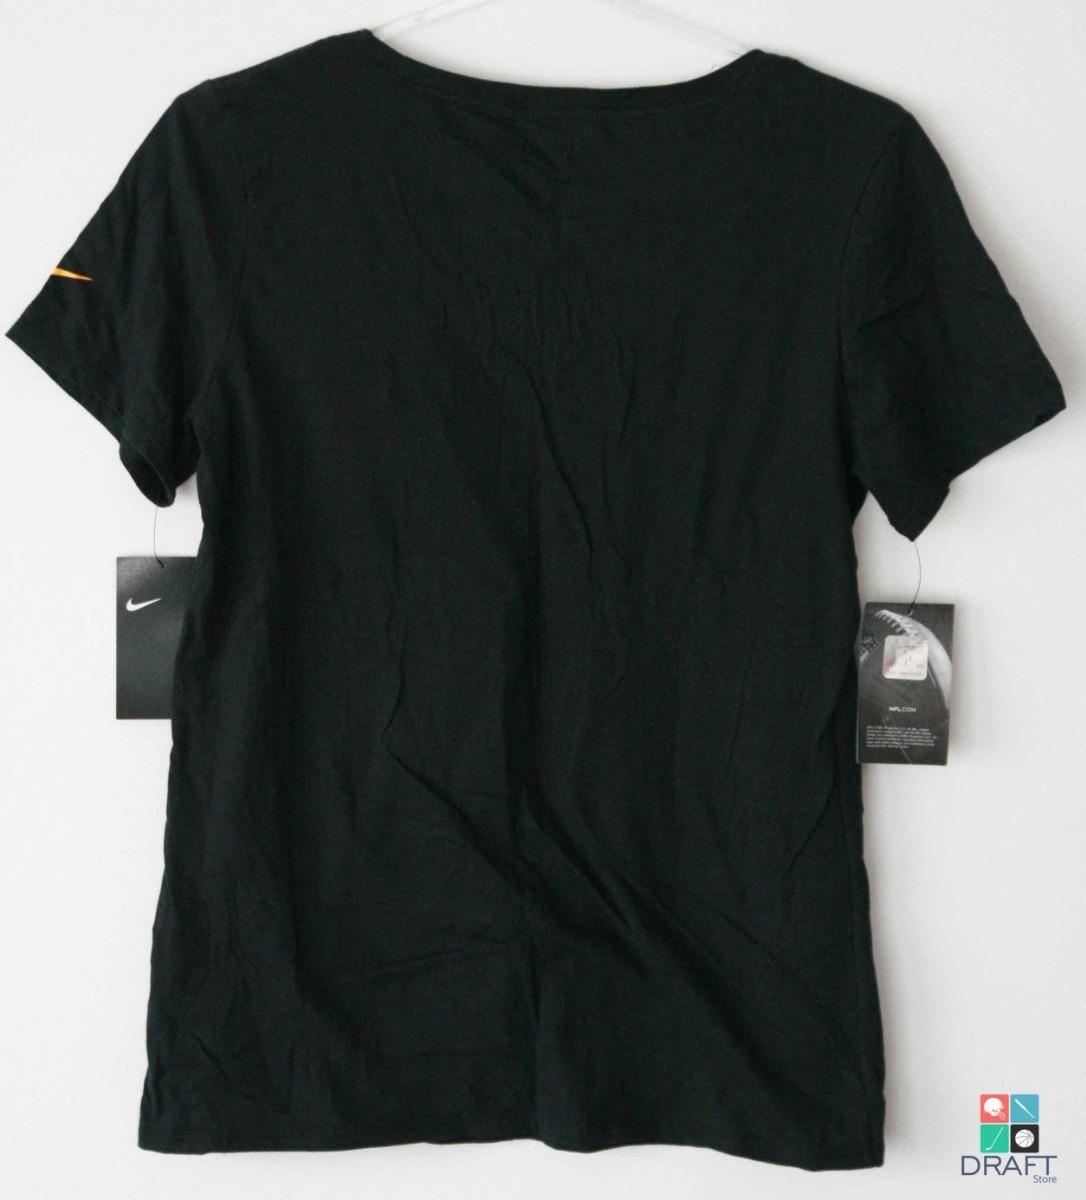 f298f10f3 camisa feminina nfl nike steelers brown juju ben draft store. Carregando  zoom.